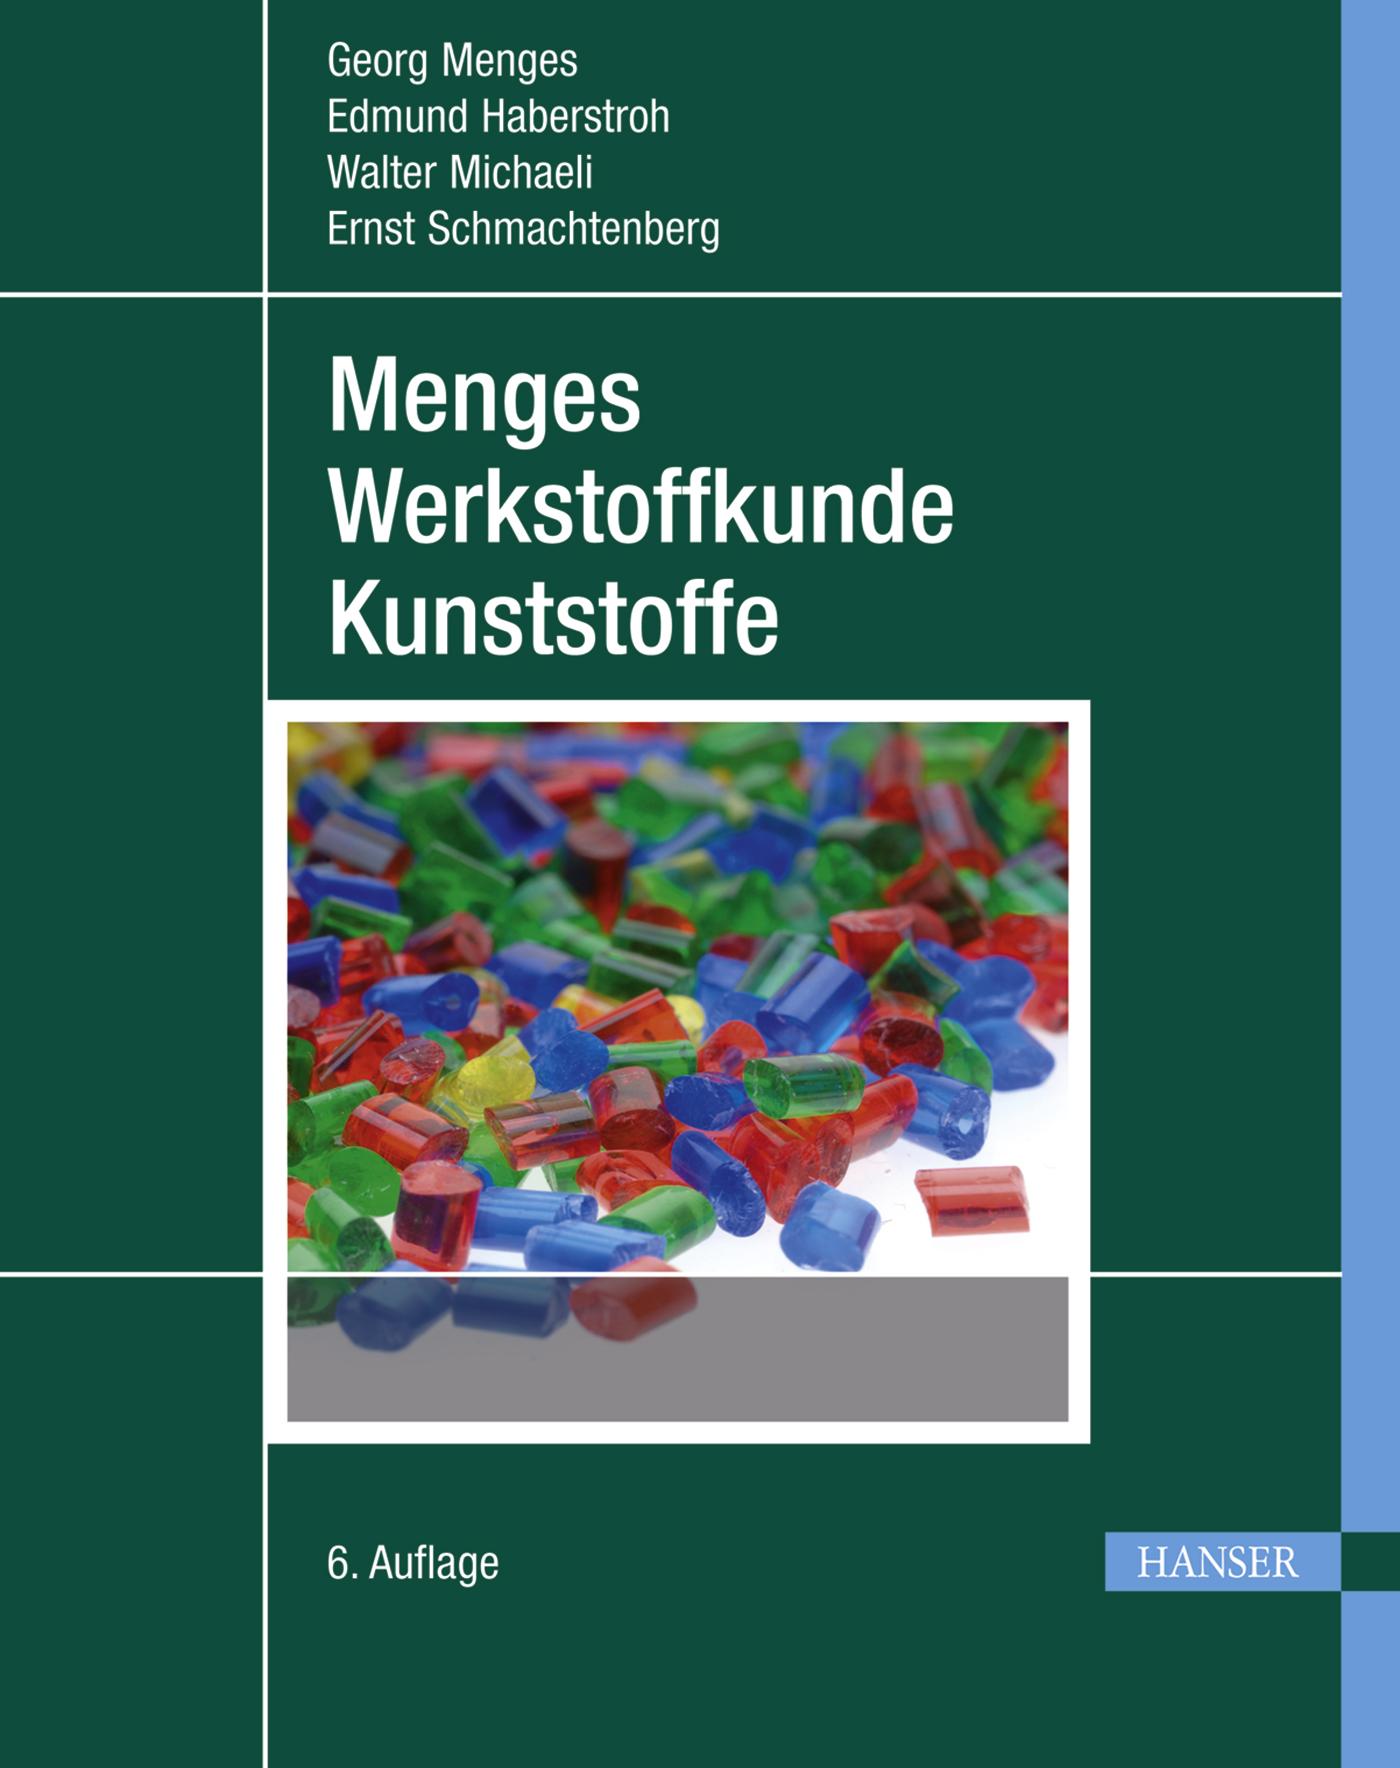 Menges, Haberstroh, Michaeli, Schmachtenberg, Menges Werkstoffkunde Kunststoffe, 978-3-446-42762-4